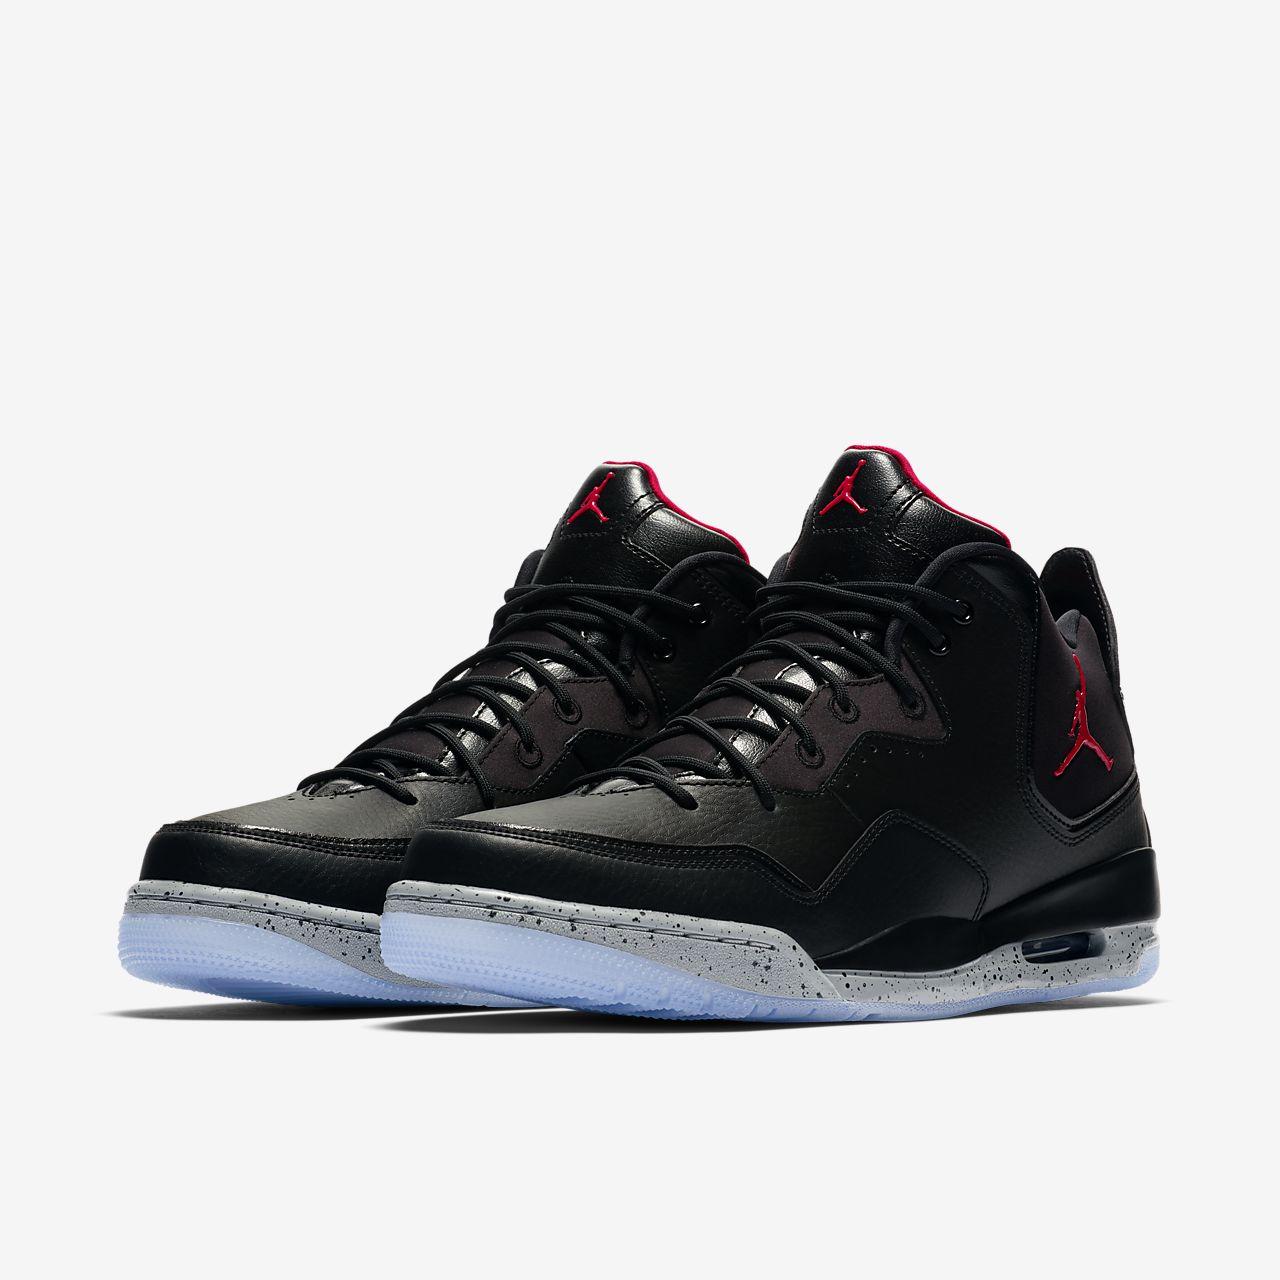 Jordan Courtside 23 / Black ocS2FrFTLN